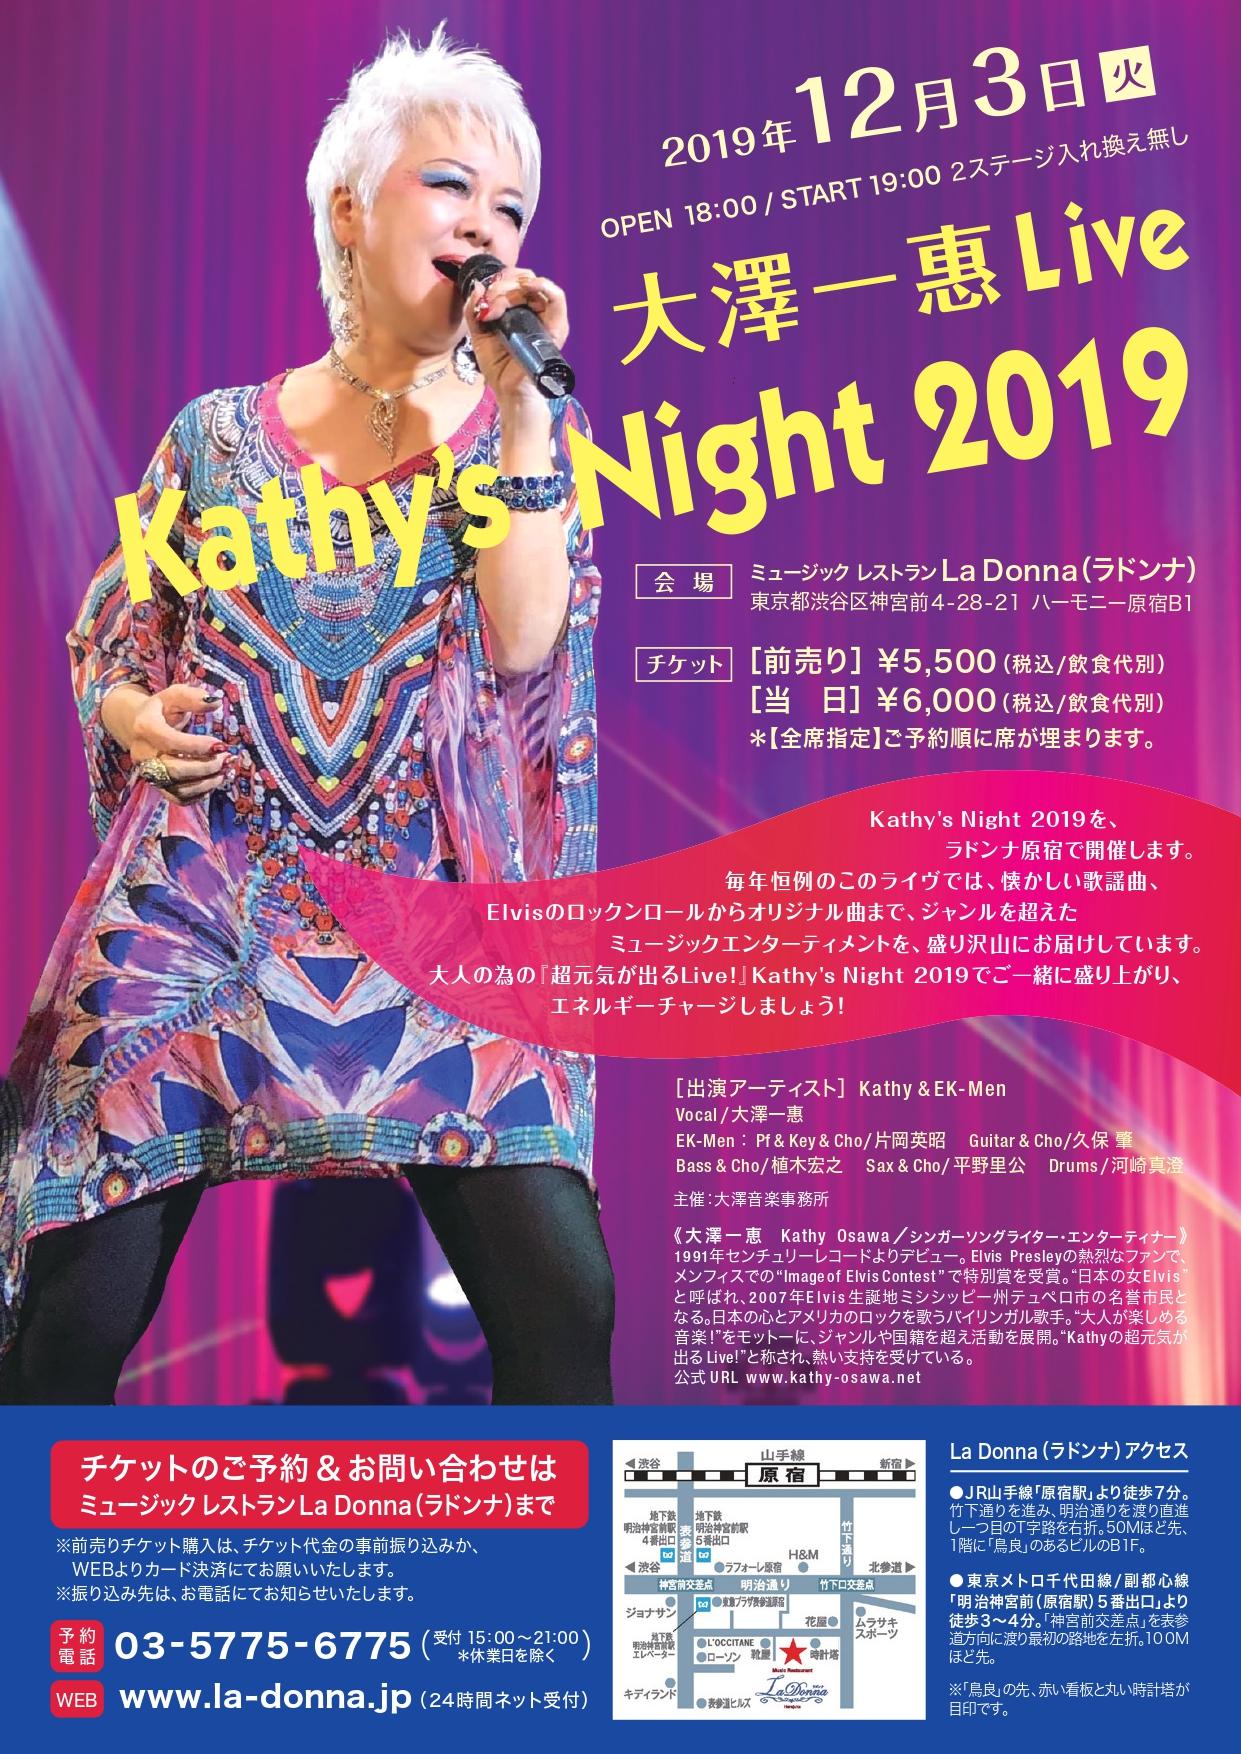 大澤一惠 LIVE Kathy's Night 2019